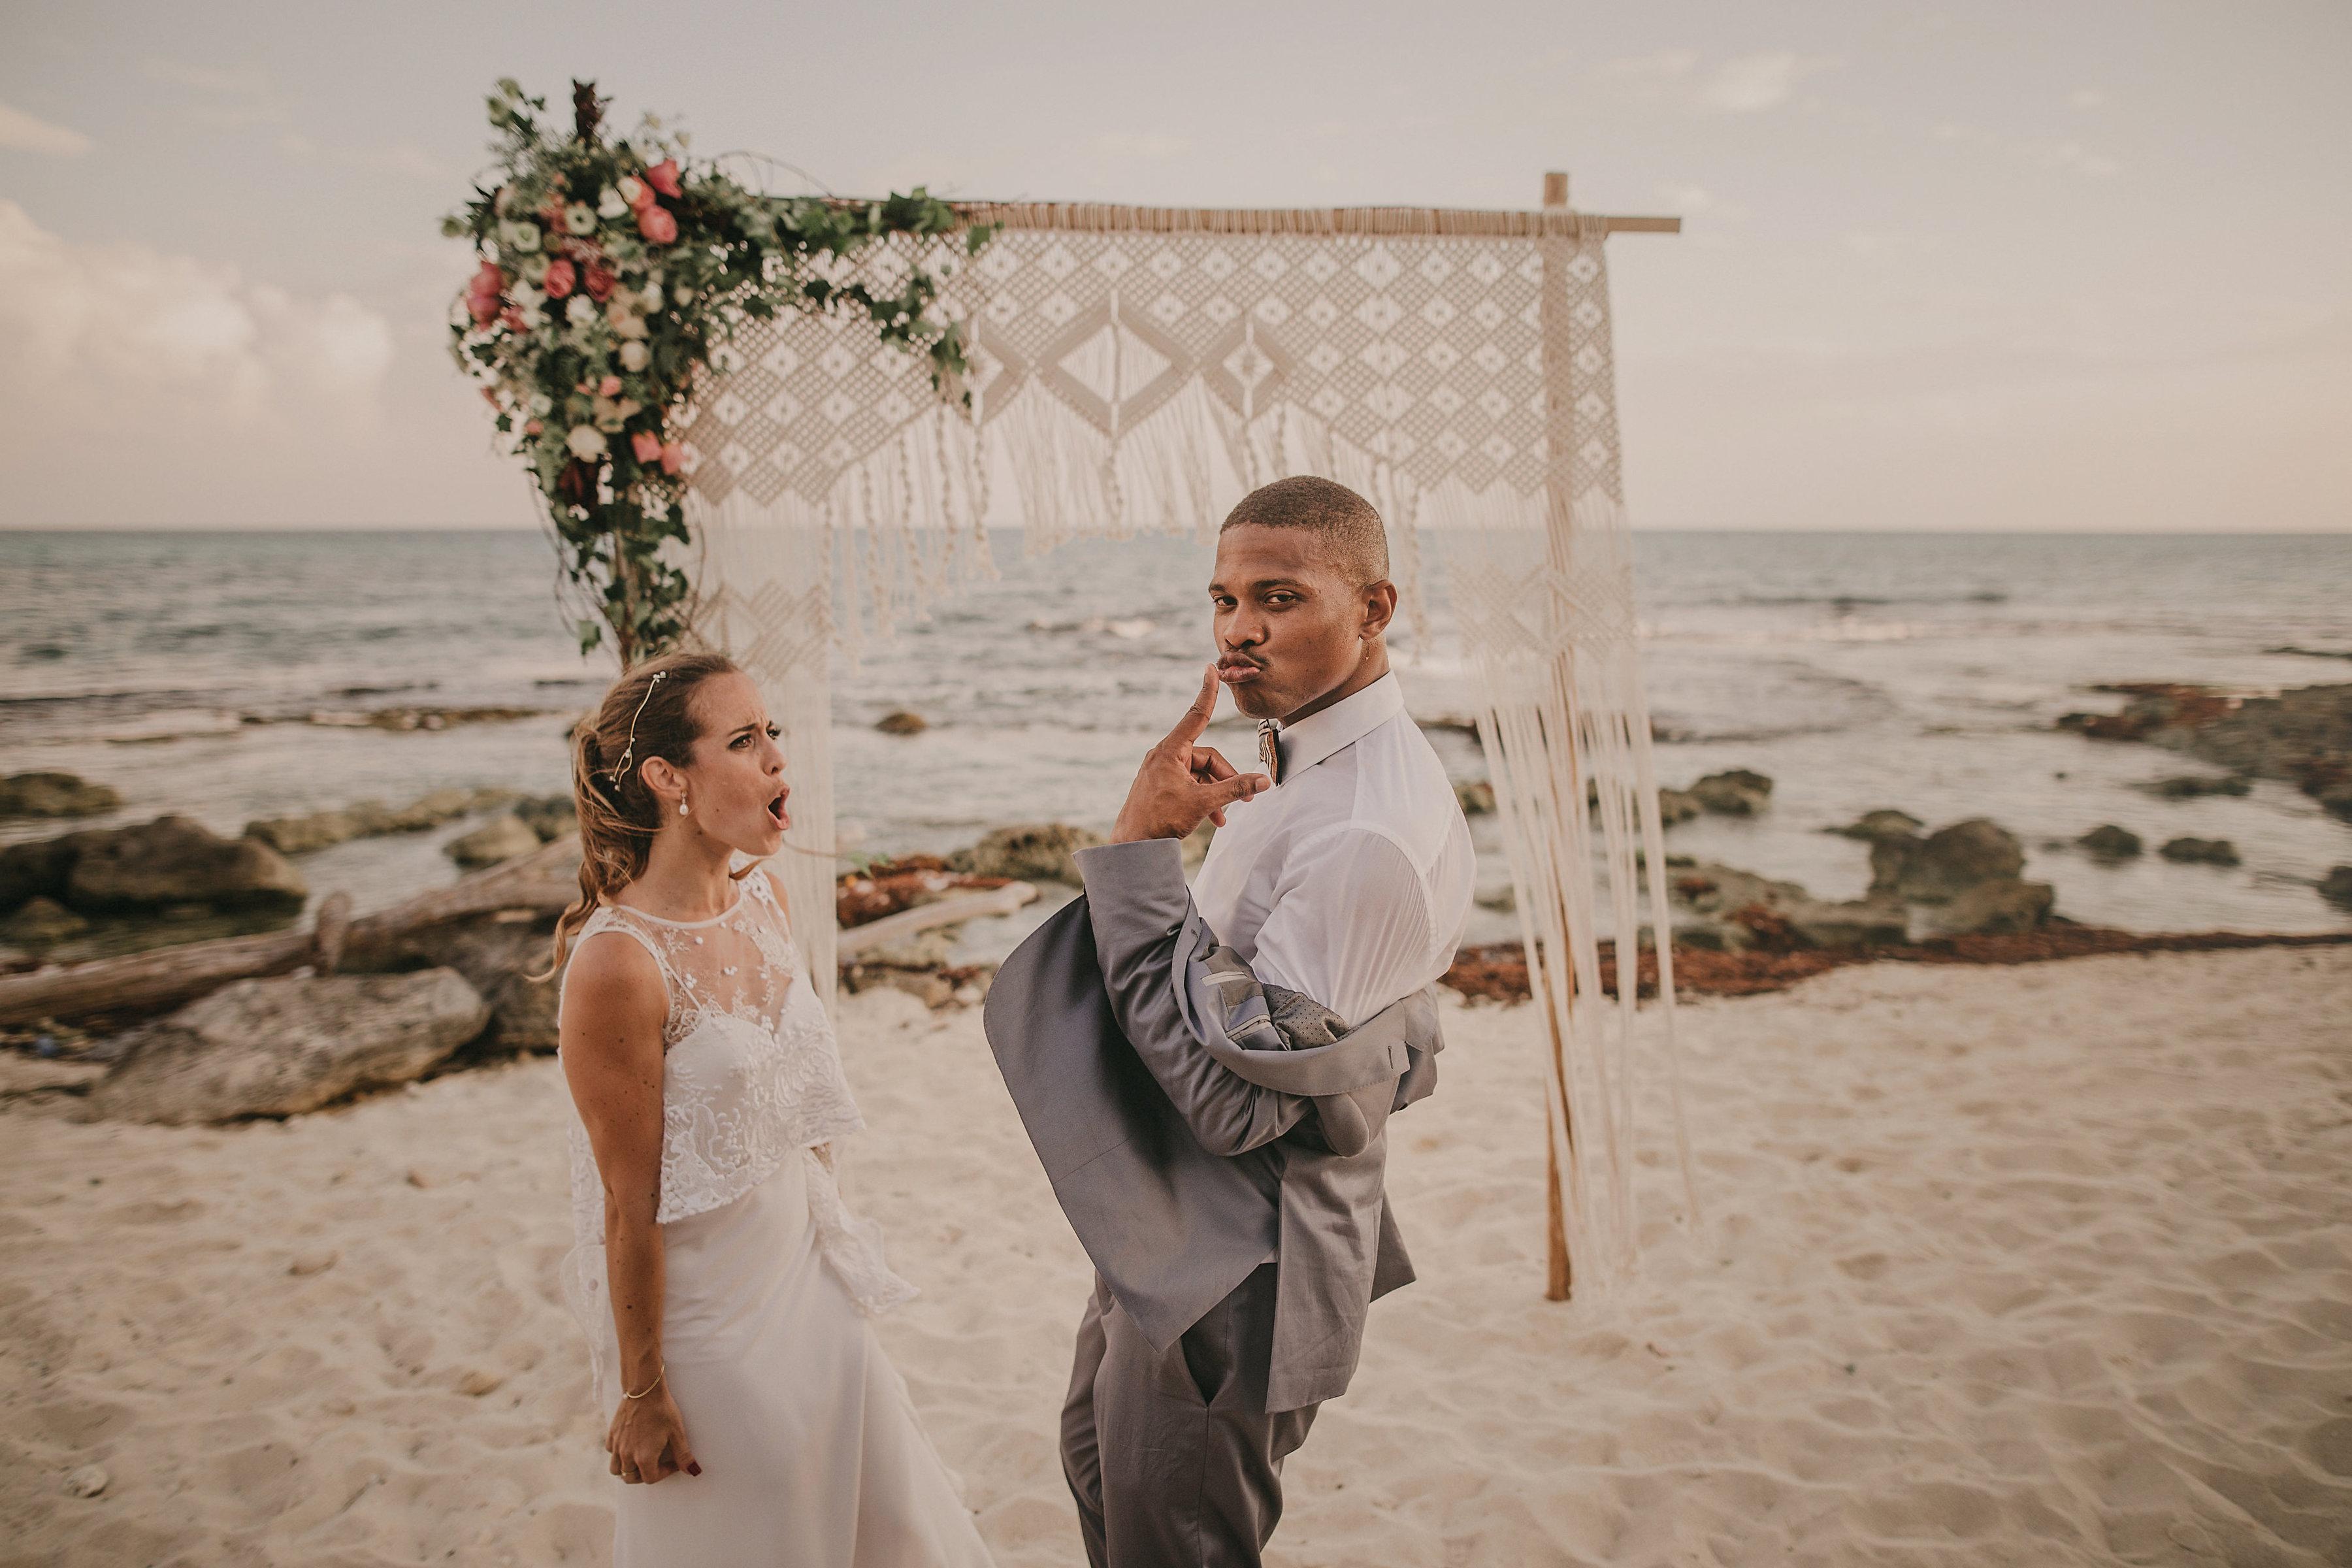 The Creative's Loft Destination Wedding Film